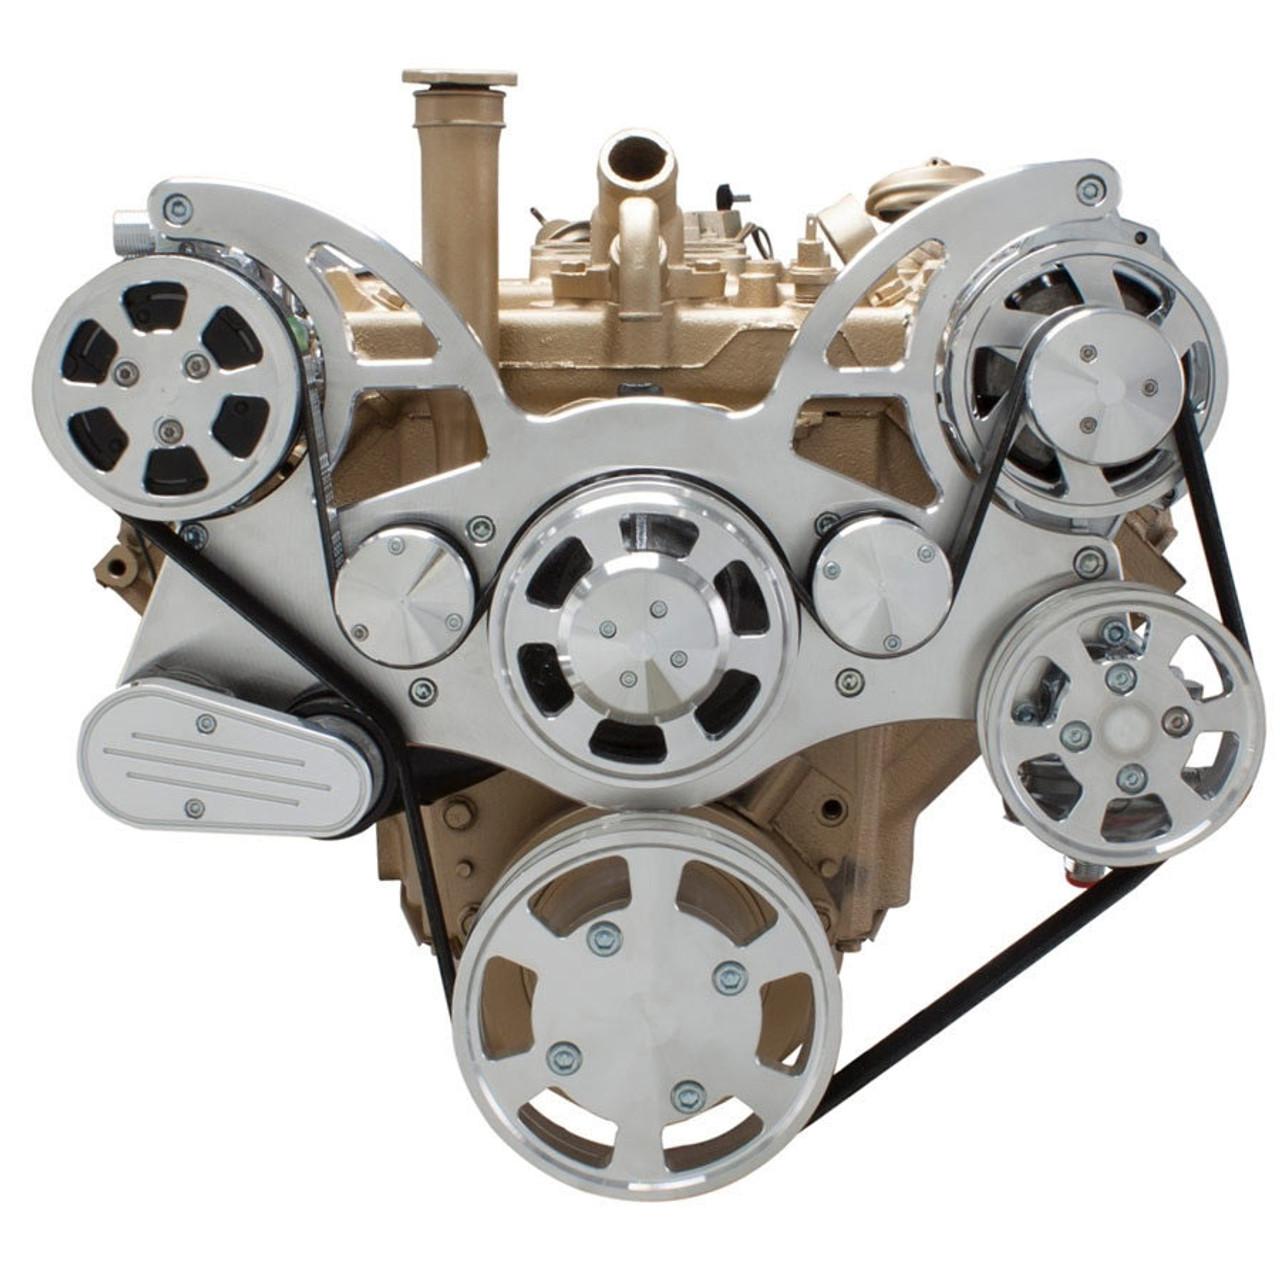 medium resolution of  97 c230 belt diagram serpentine conversion kit for oldsmobile 350